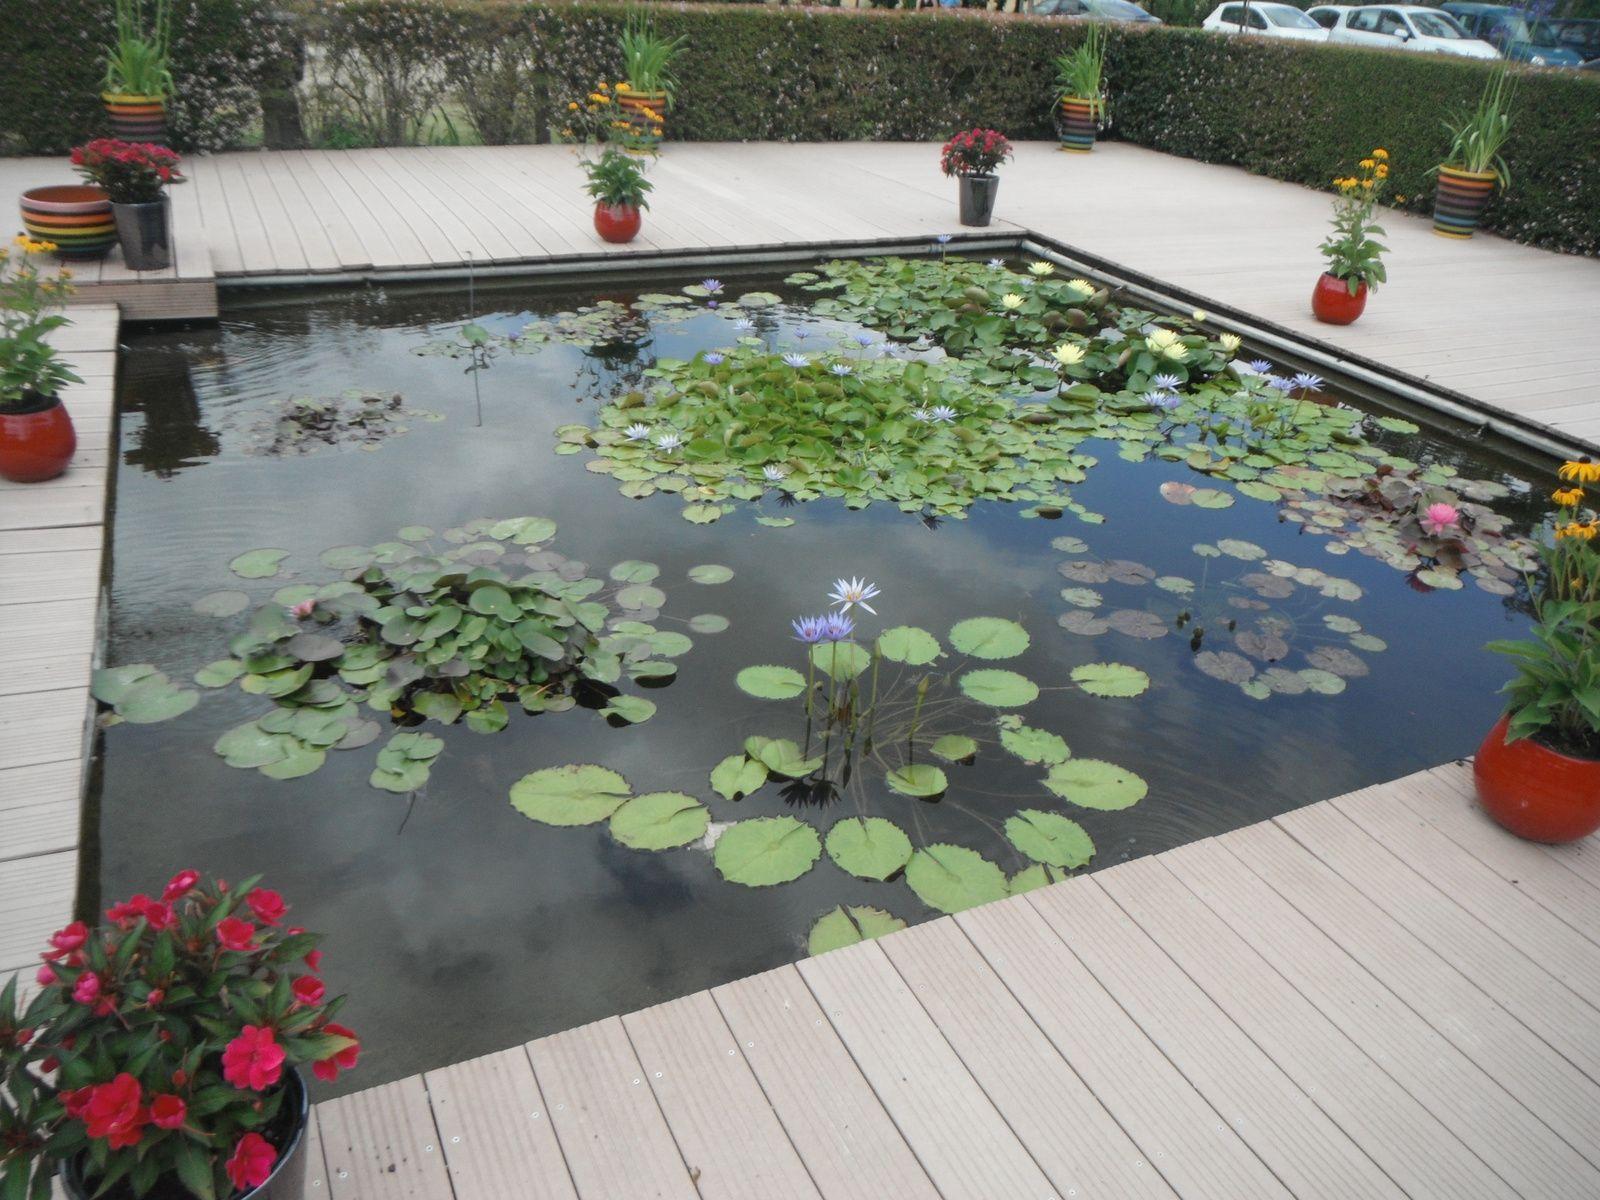 Le Jardin des Martels, Giroussens, Tarn (81)